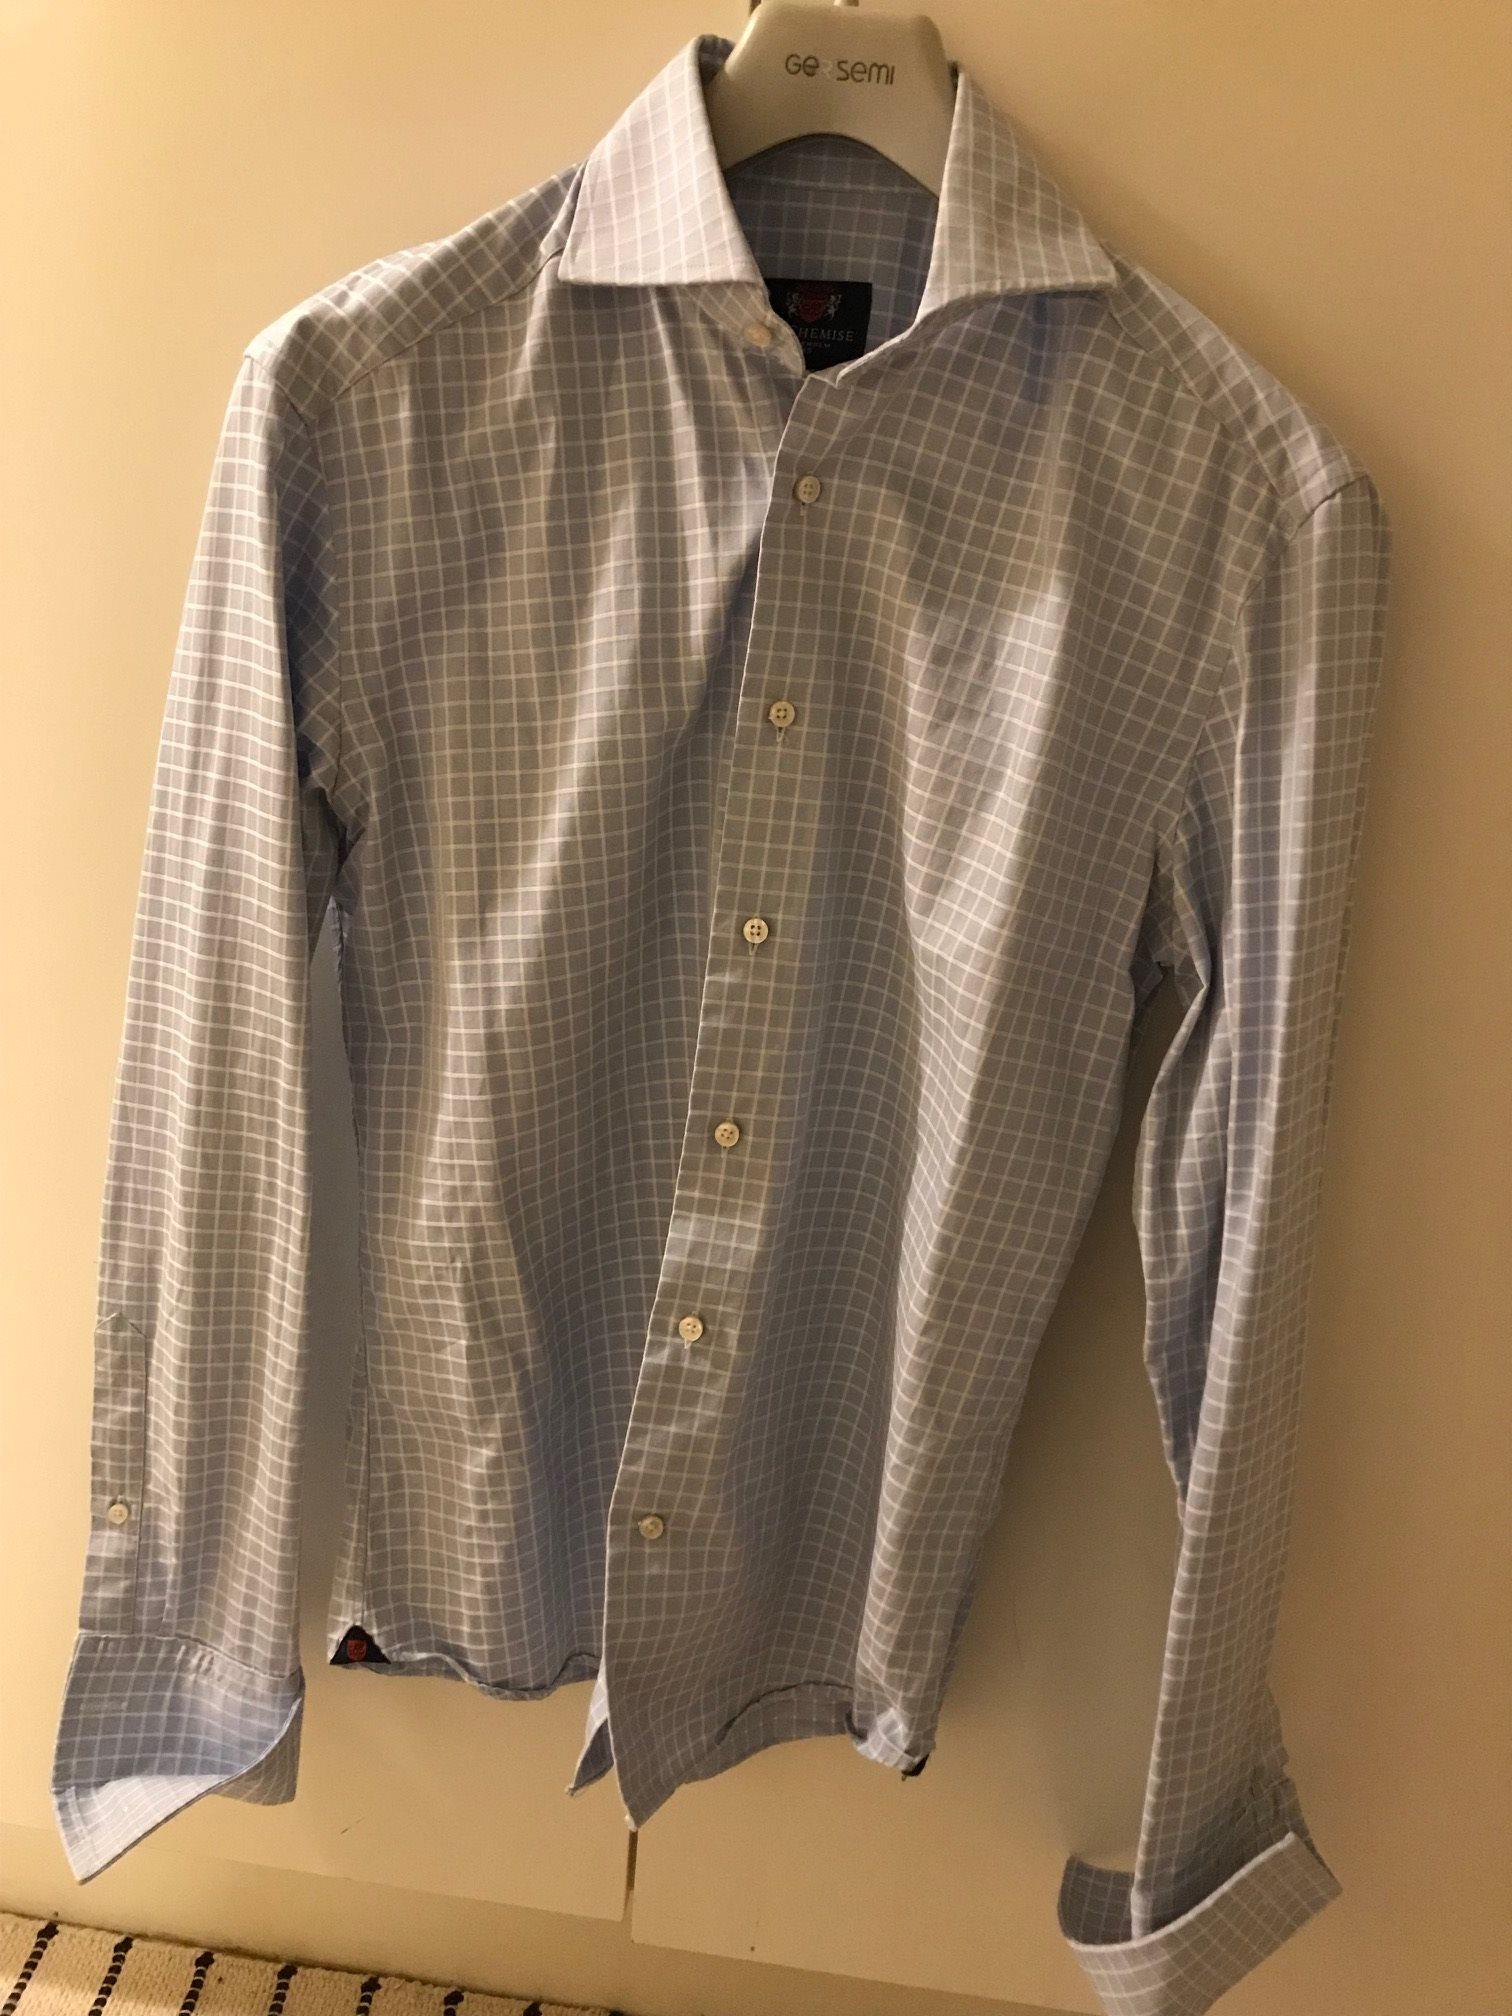 La Chemise skjorta i fint skick - storlek 38 (336782304) ᐈ Köp på ... c204188141be9